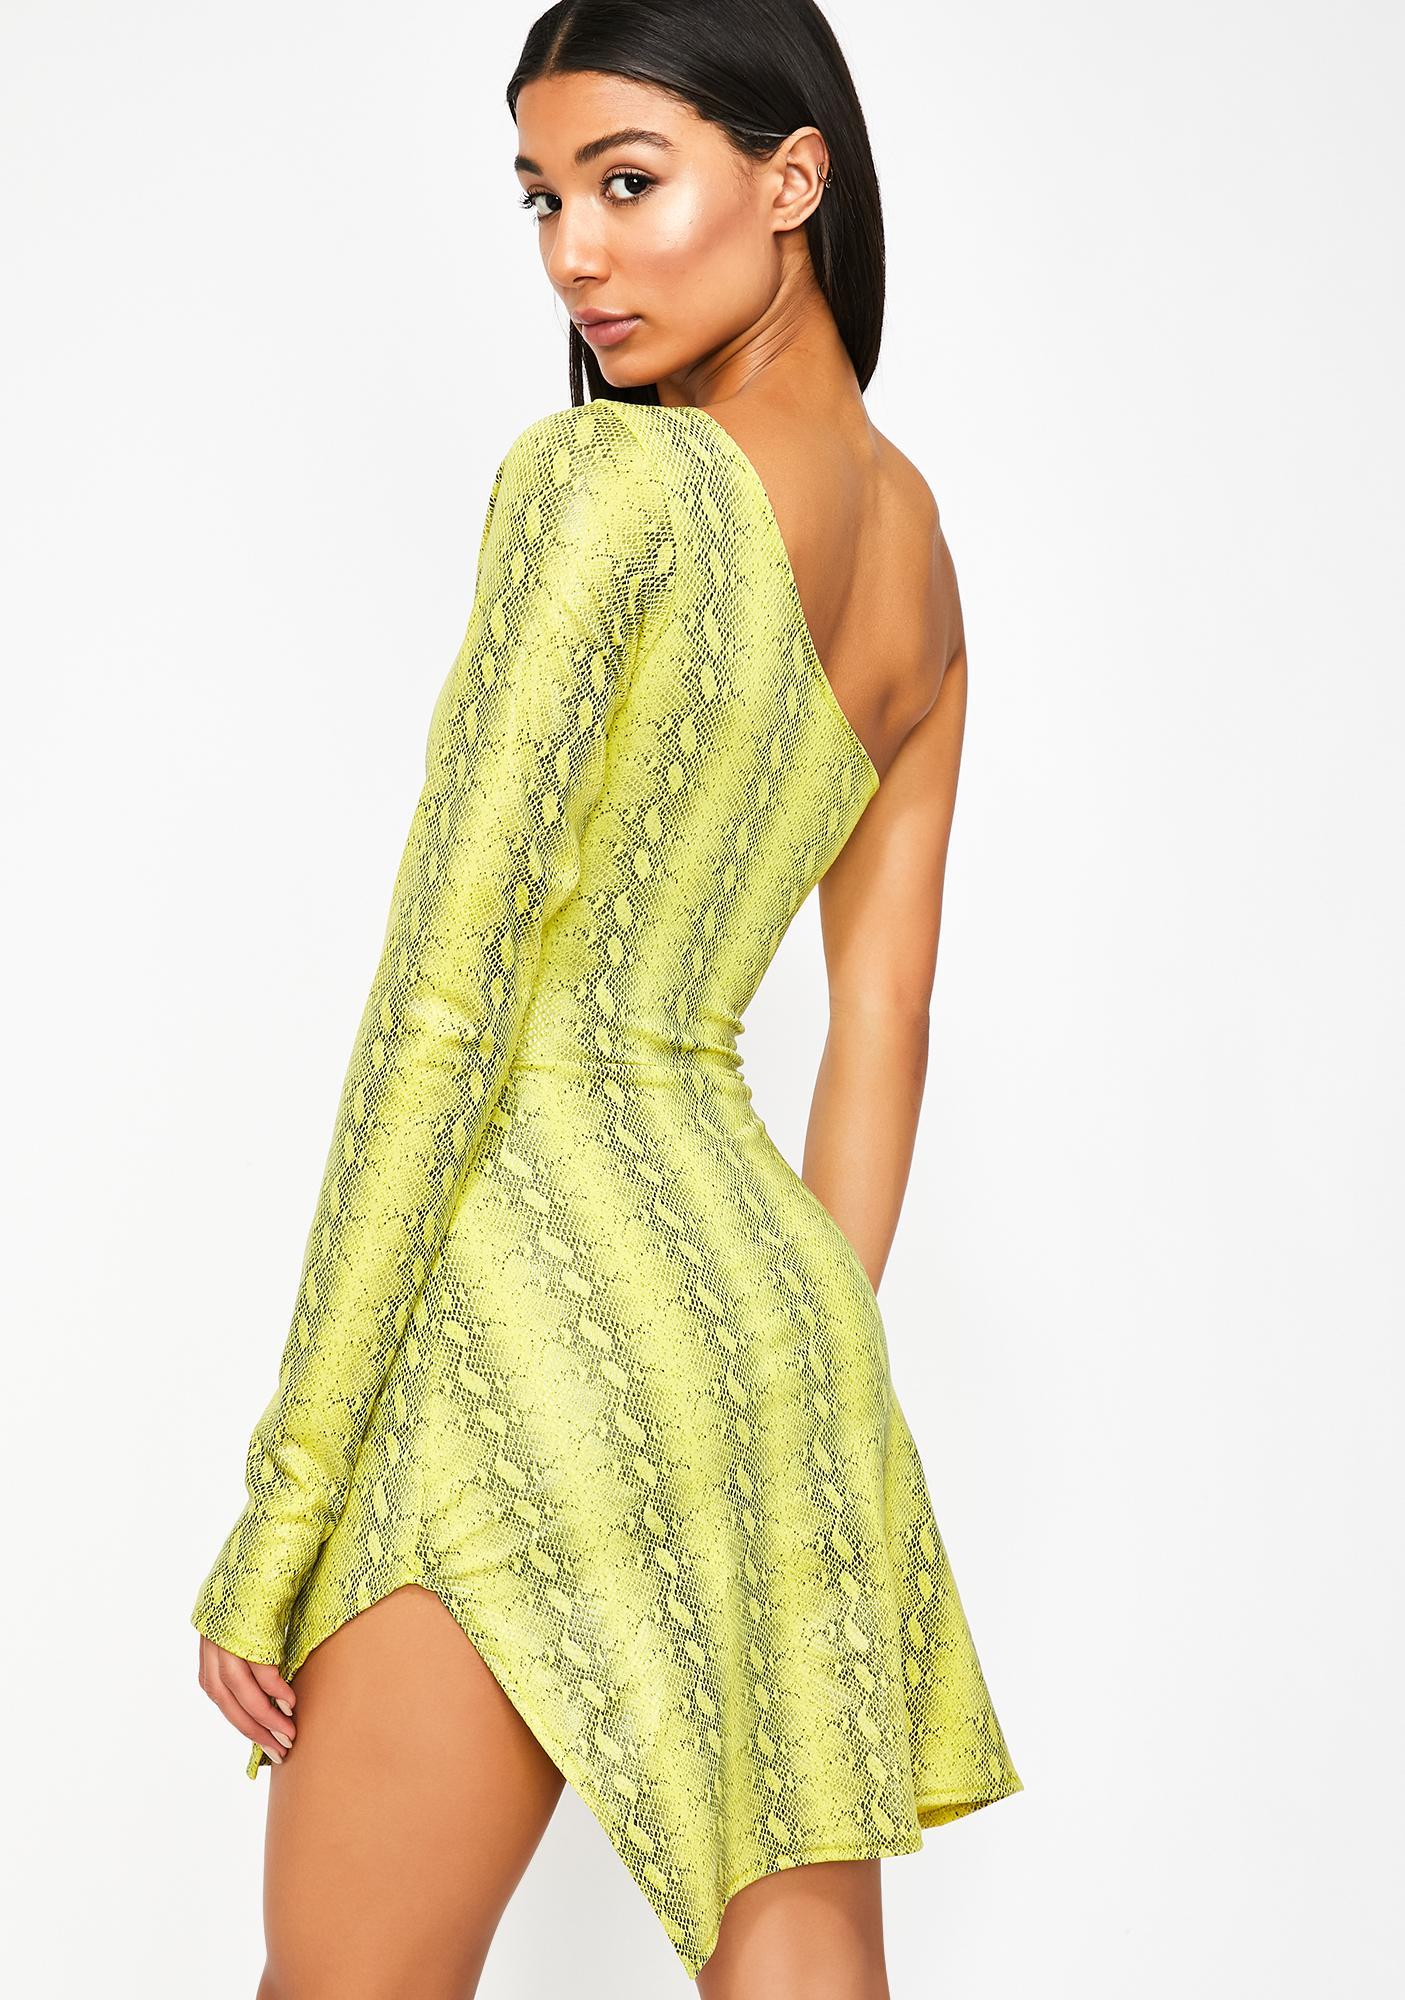 TLZ L' FEMME One Shoulder Mini Dress